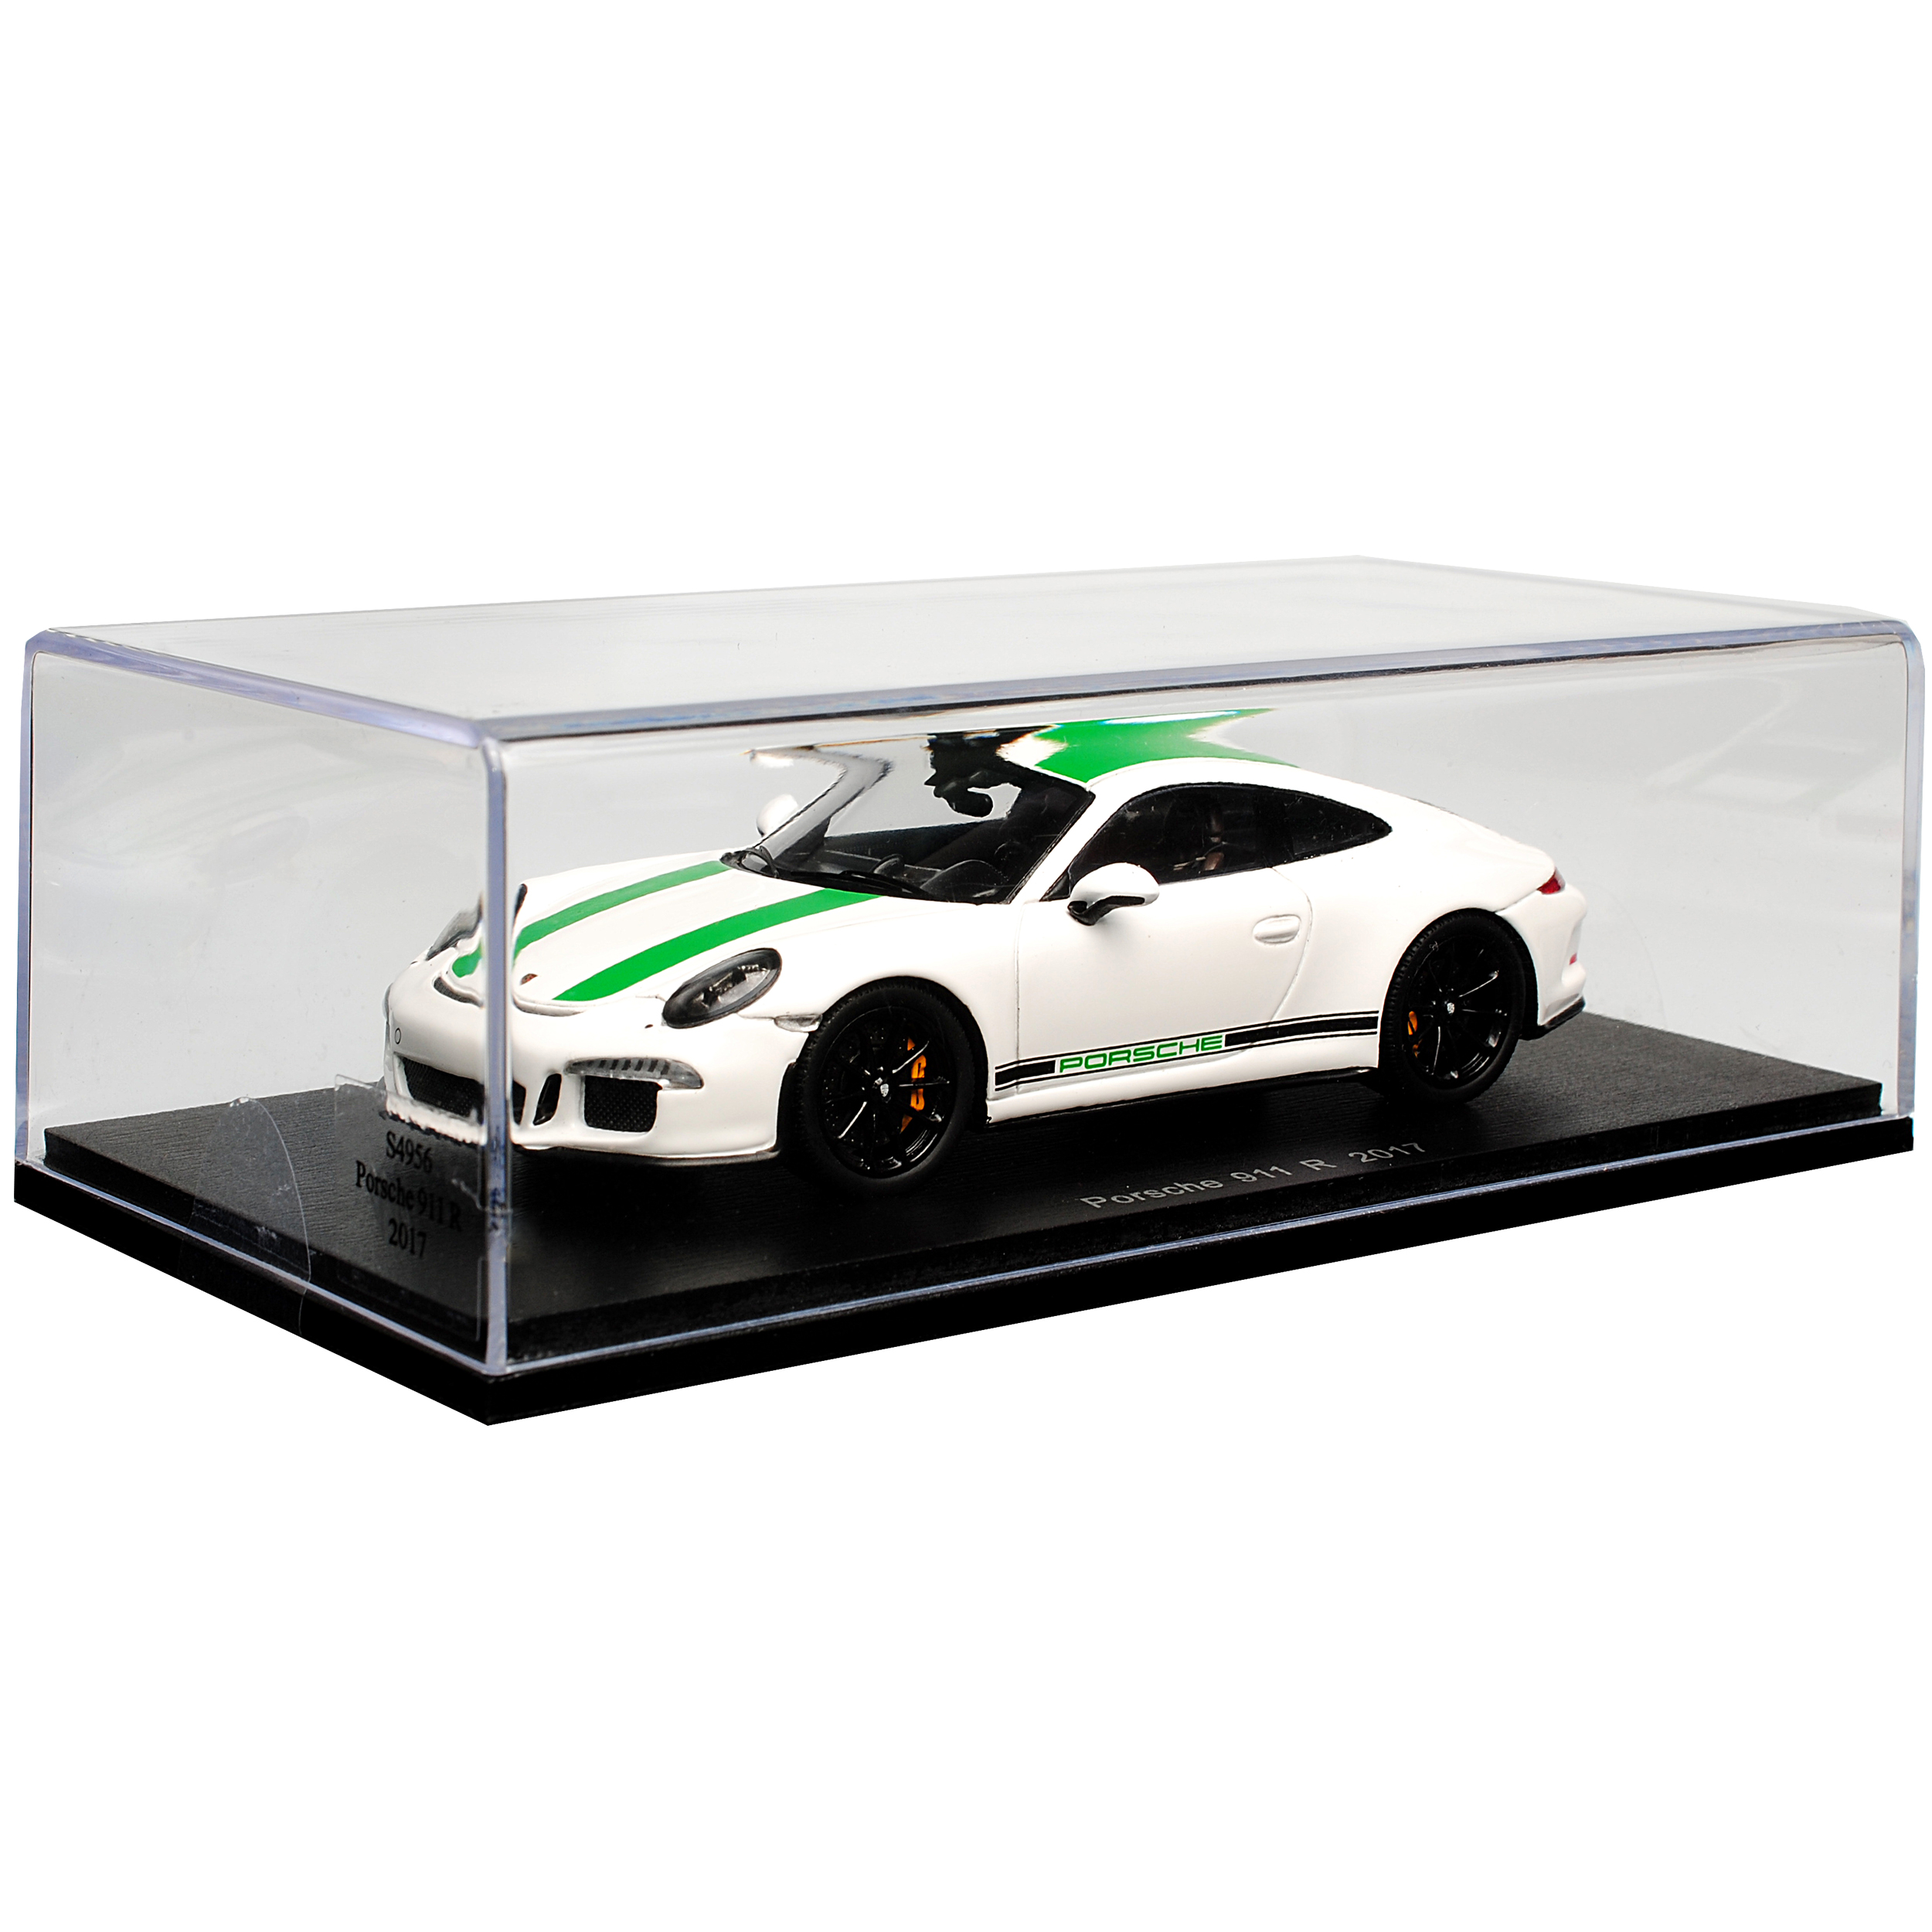 Porsche 911 991 R Coupe Weiss Weiss Weiss mit Gruen 2017 1 43 Spark Modell Auto mit oder o.. 03cd1d